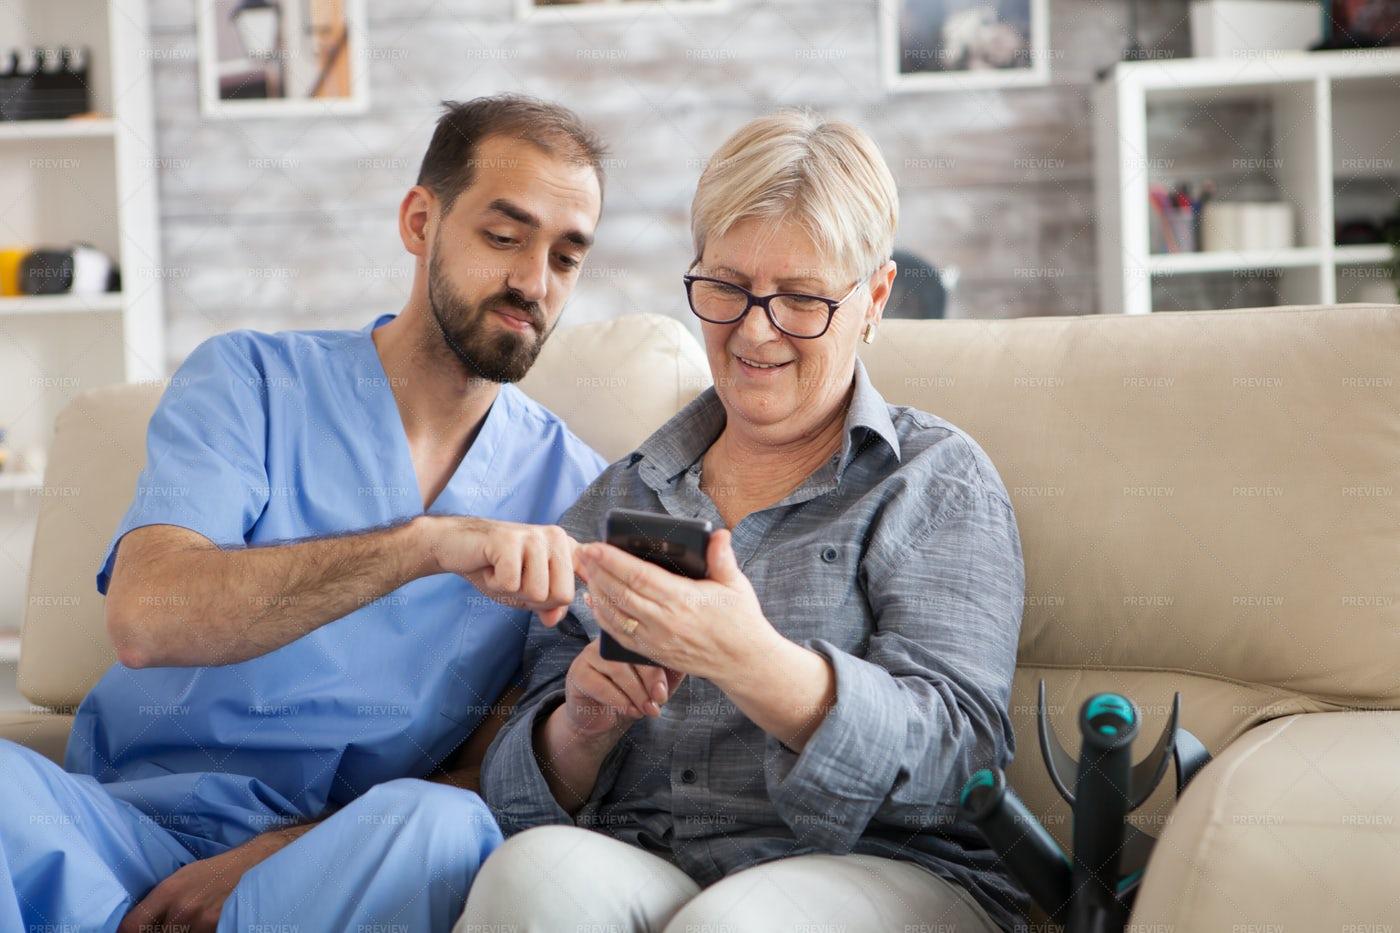 Setting Up Healthcare App: Stock Photos